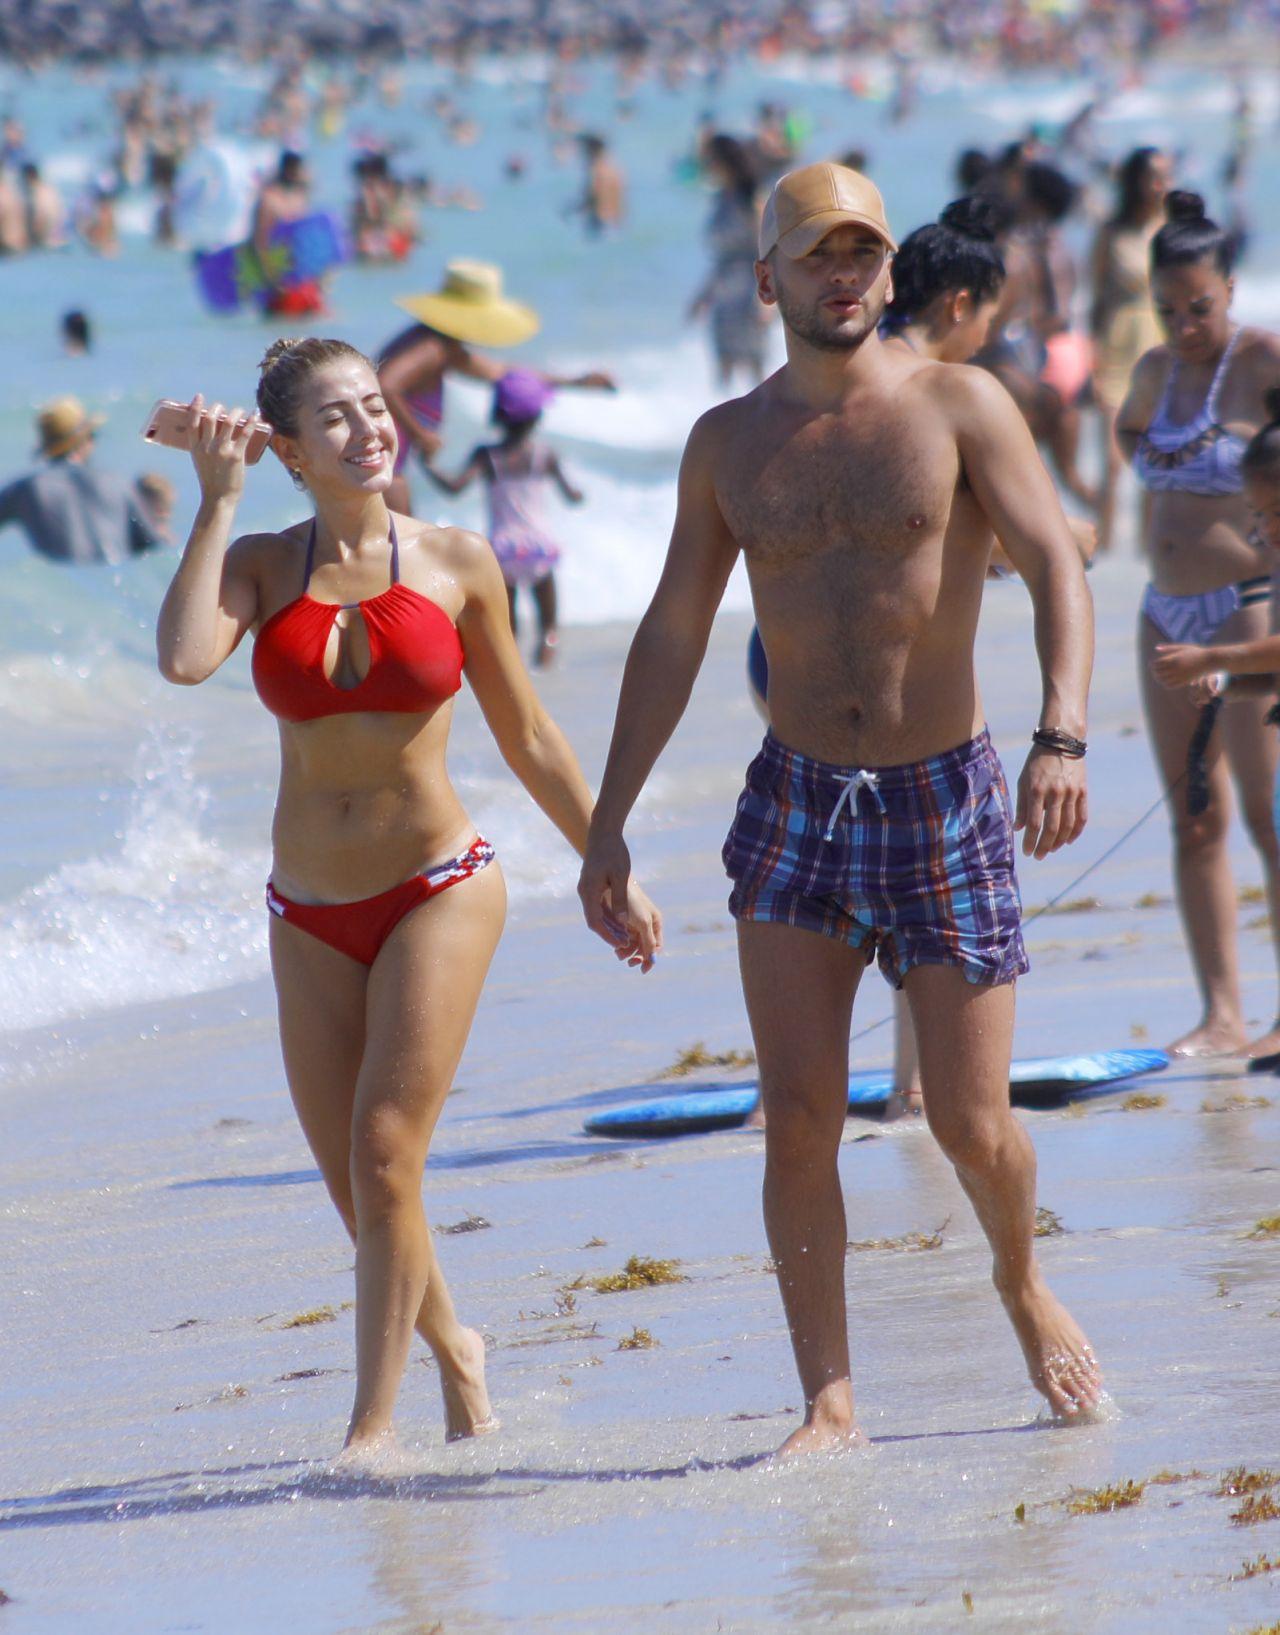 Images Valeria Orsin nudes (94 photos), Topless, Leaked, Feet, legs 2015